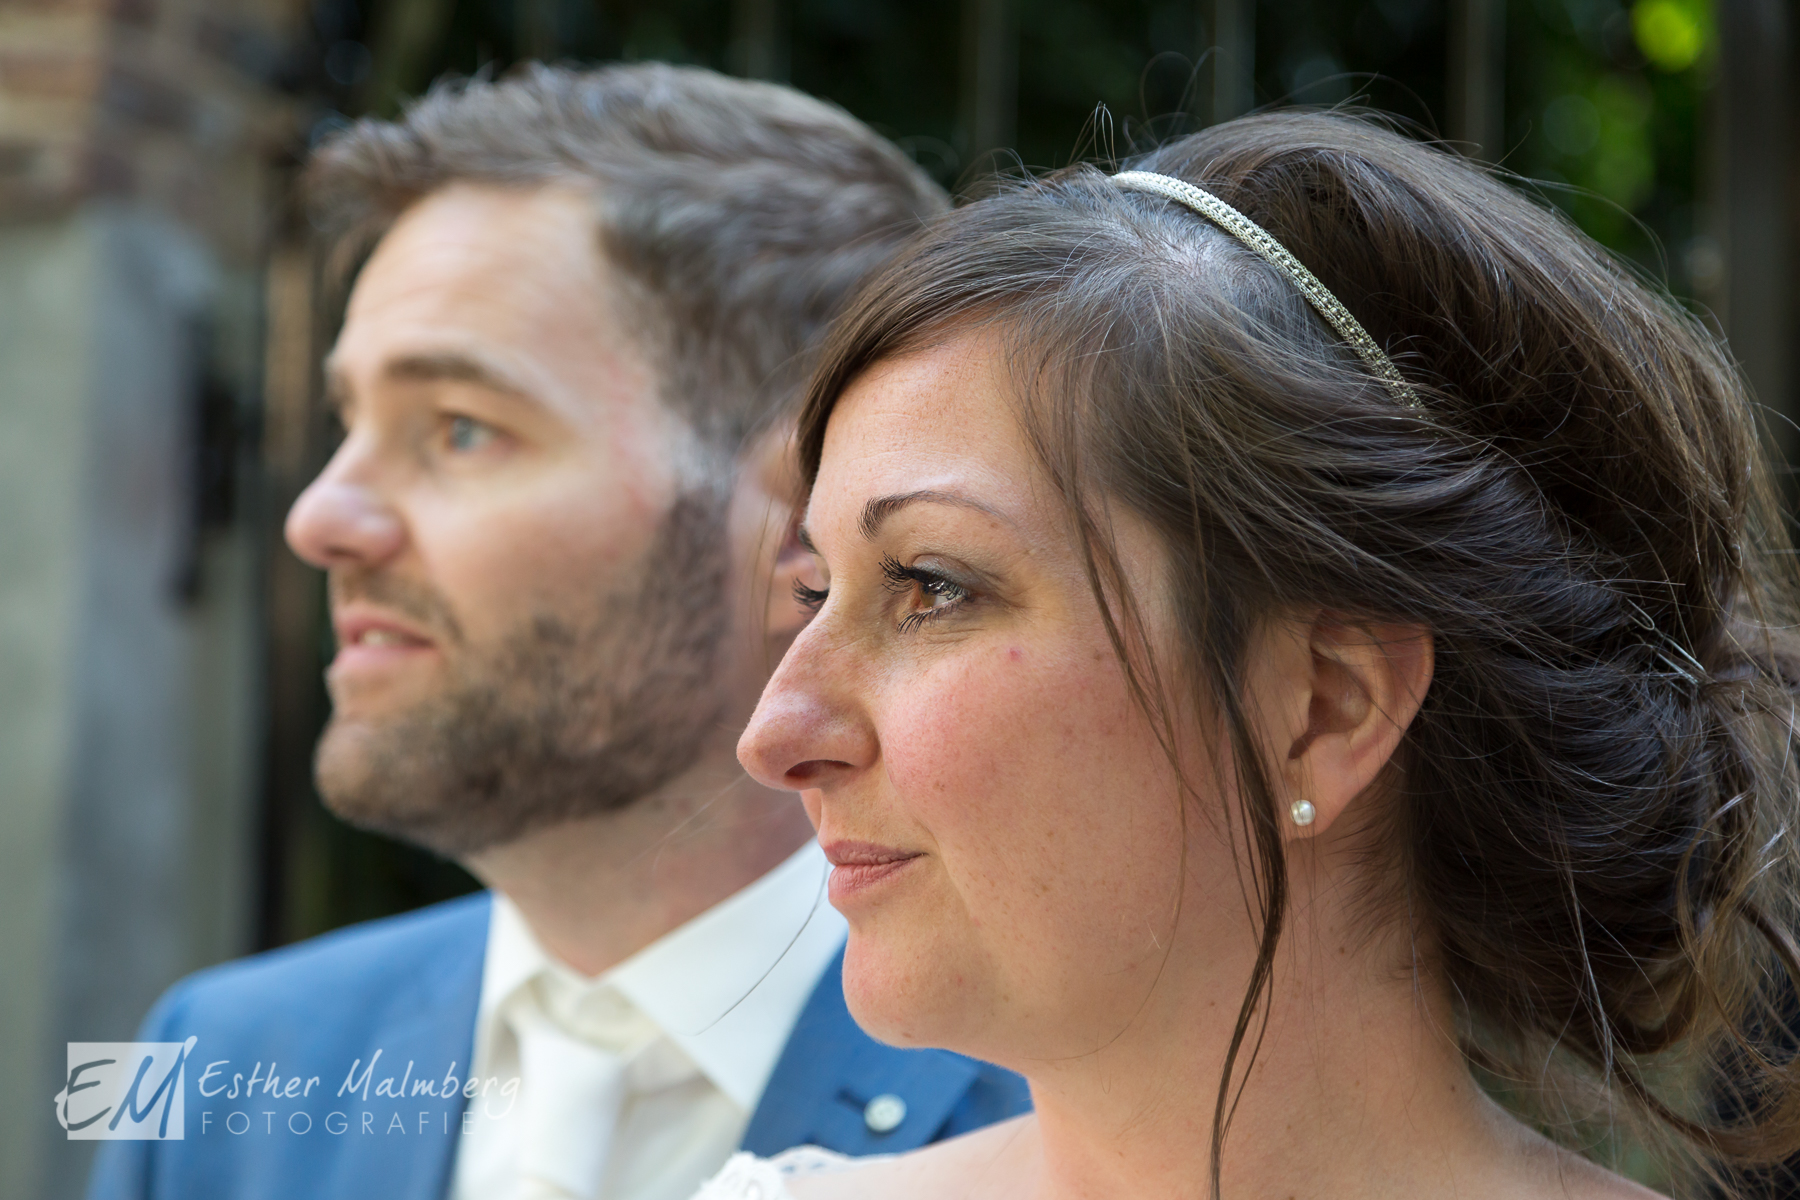 Bruidsreportage Esther Malmberg Fotografie Gouda